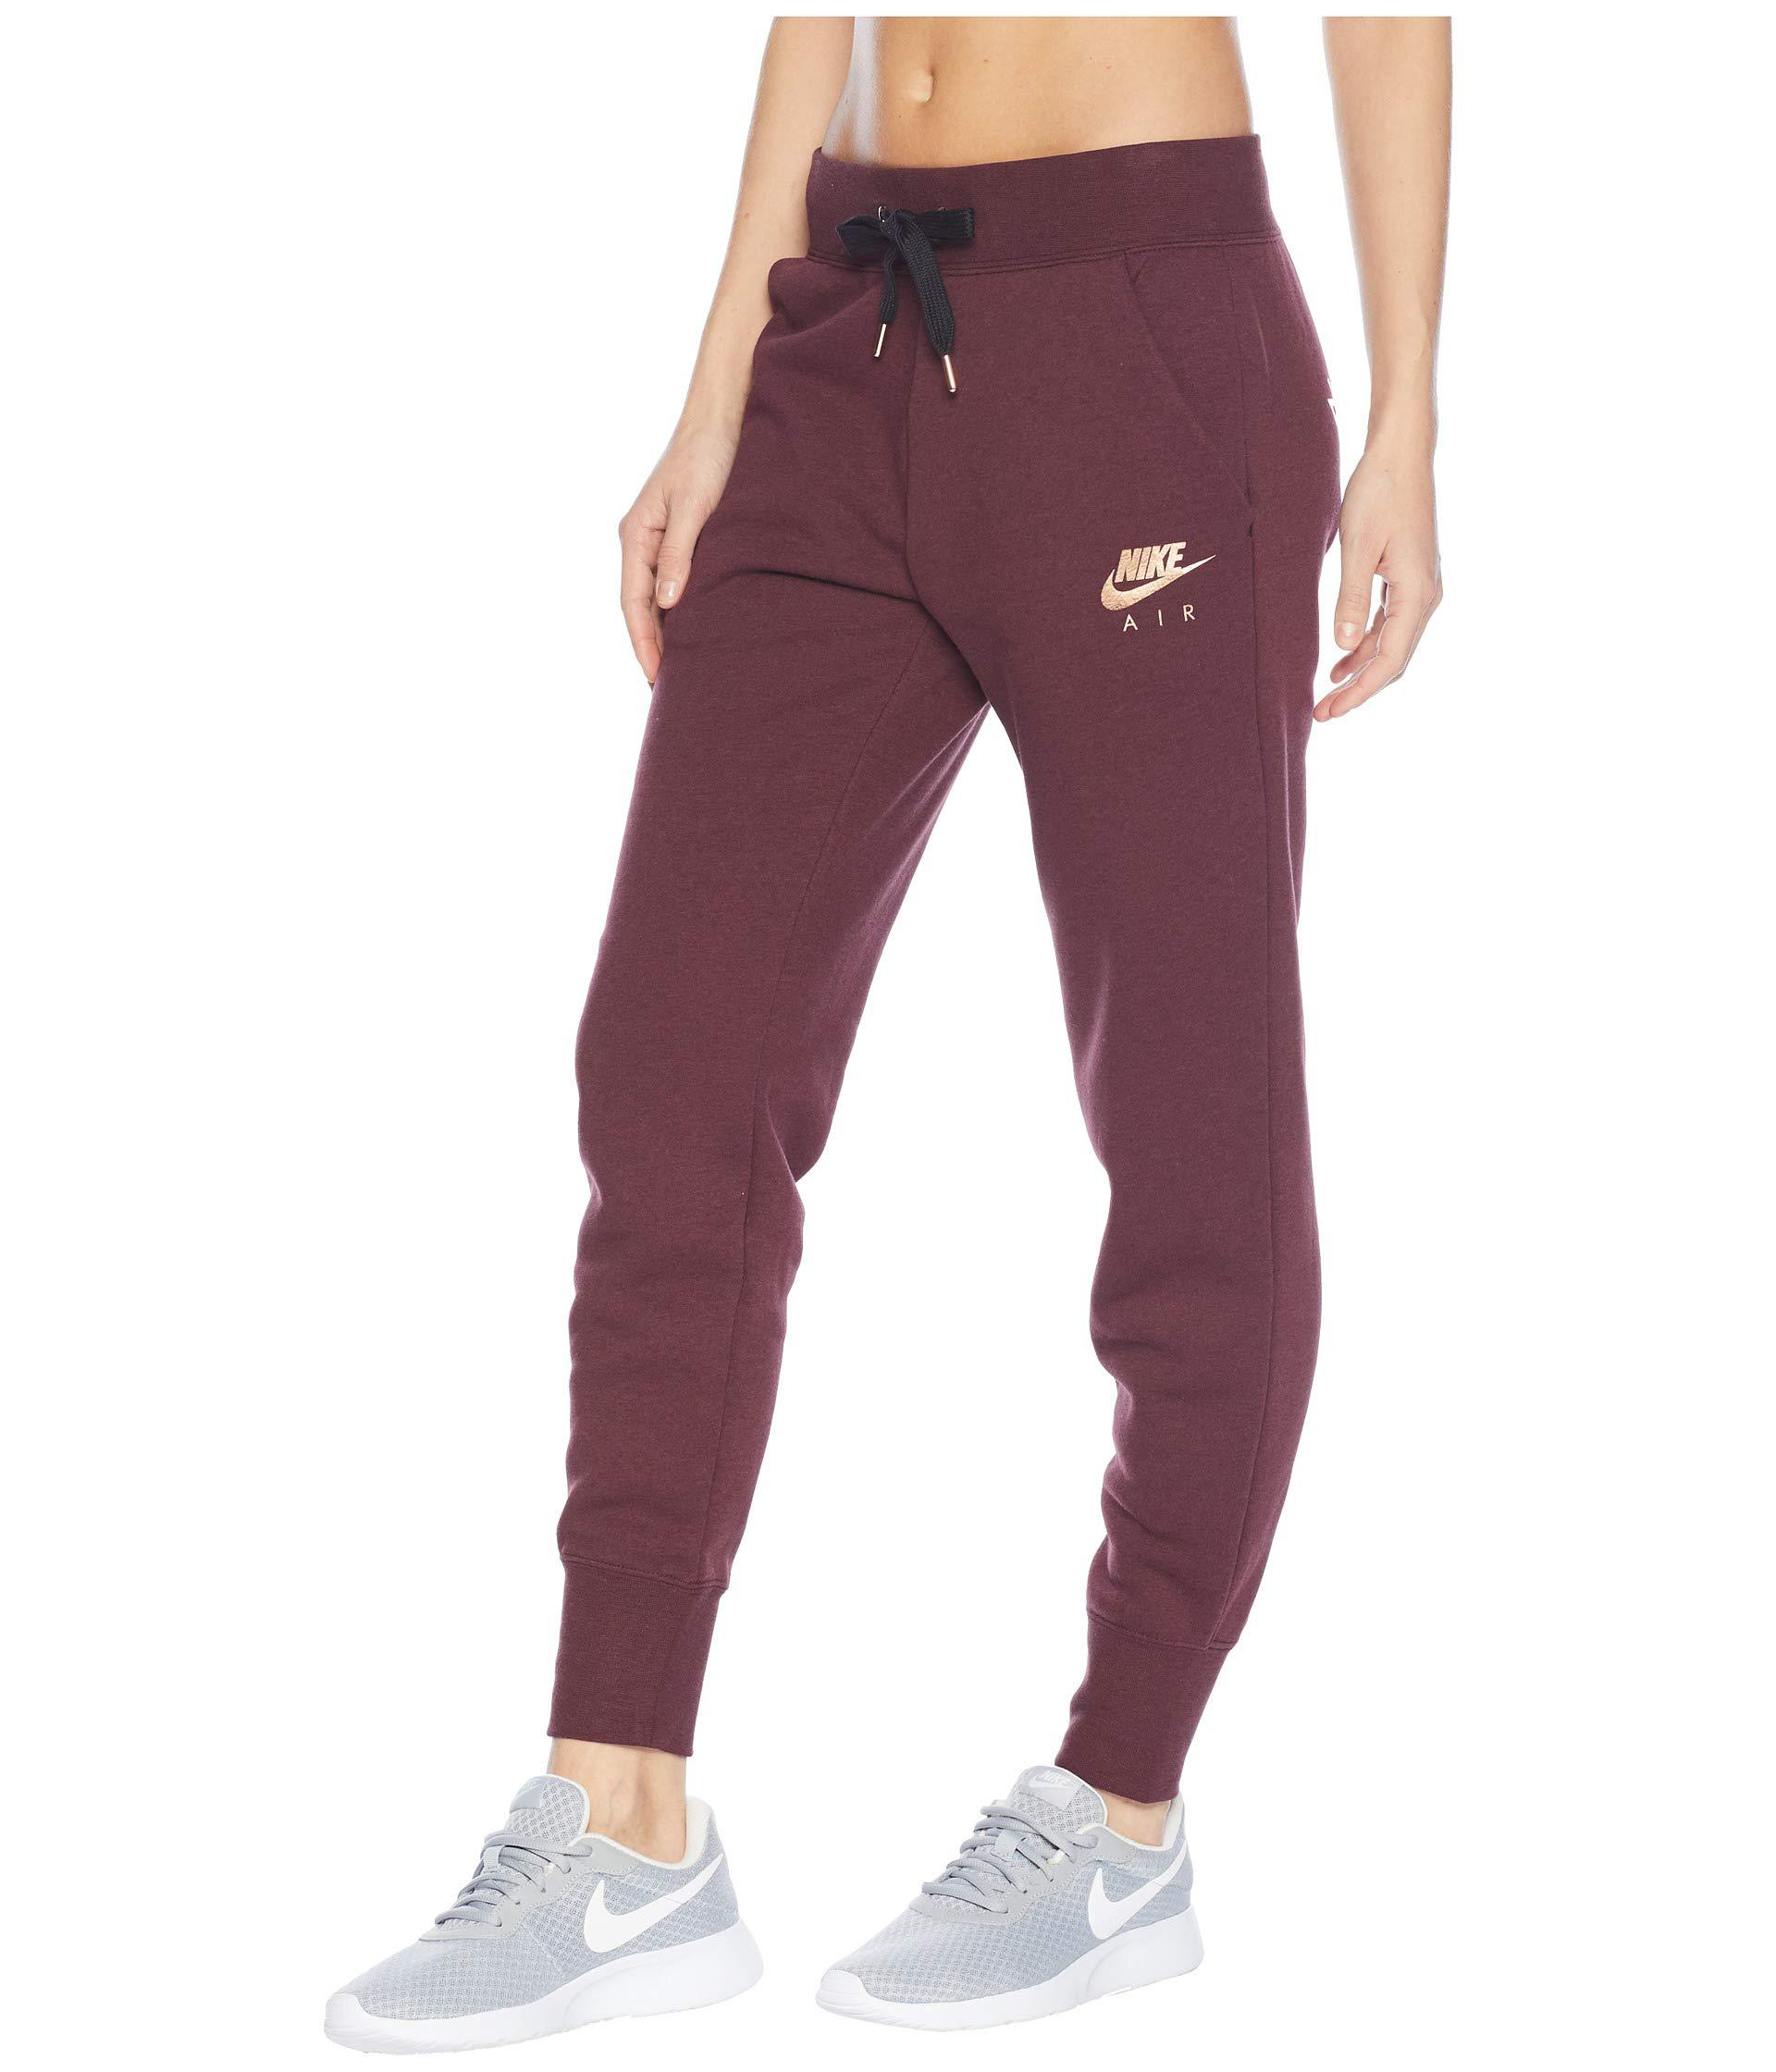 comercio Desmañado Soleado  Nike Sportswear Air Pants Reg Fleece (smokey Mauve/black) Women's ...